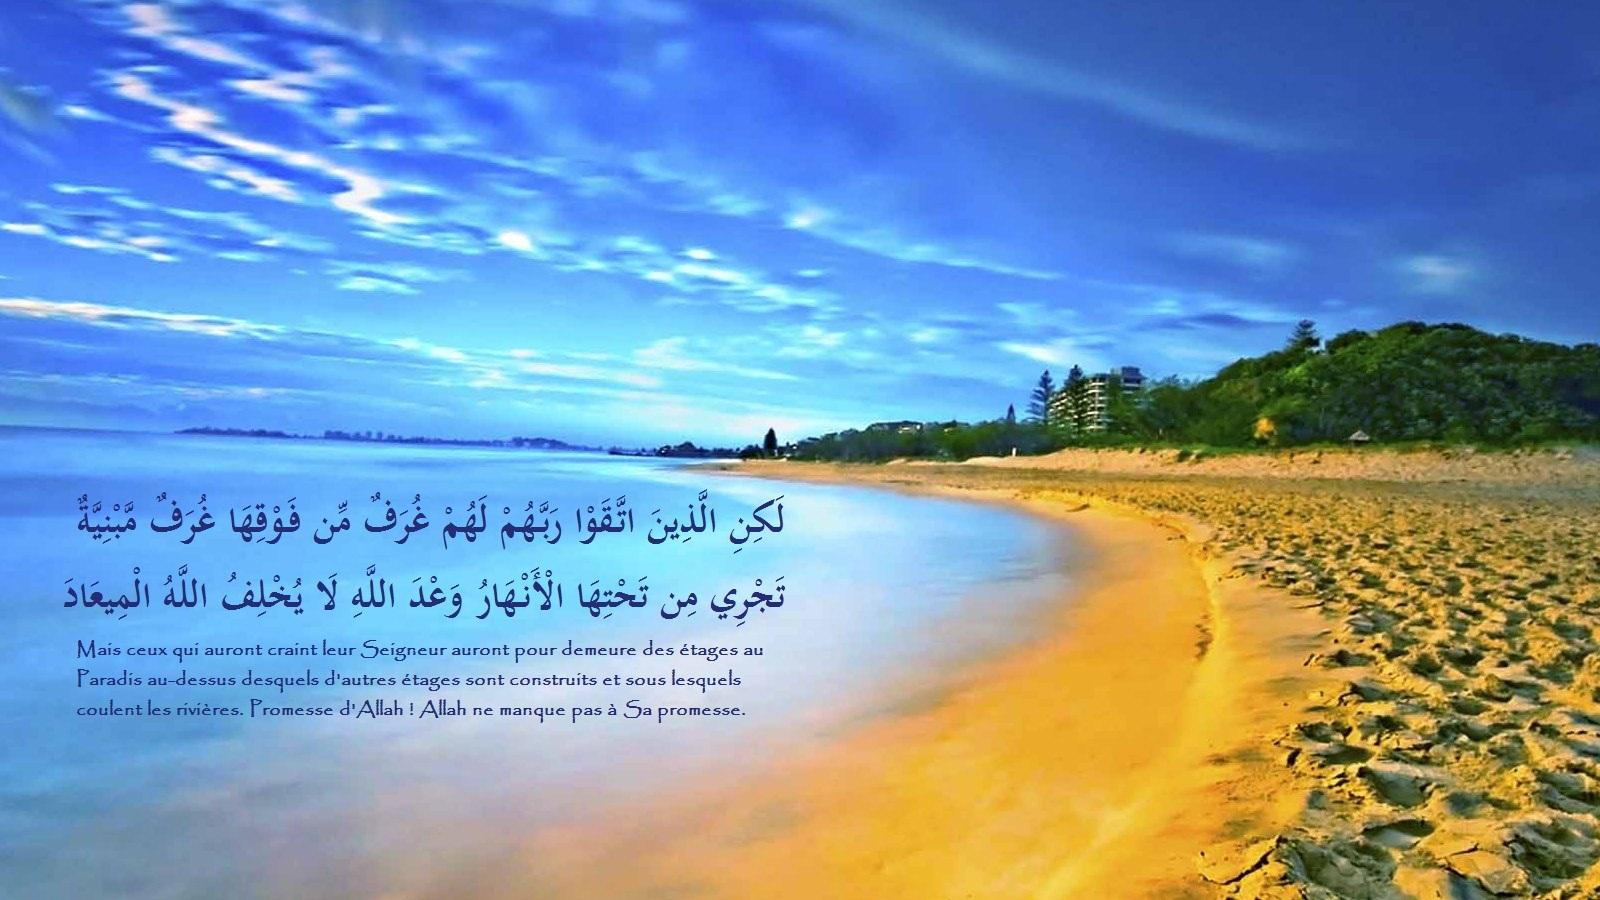 Fond ecran islam for Fond decrand